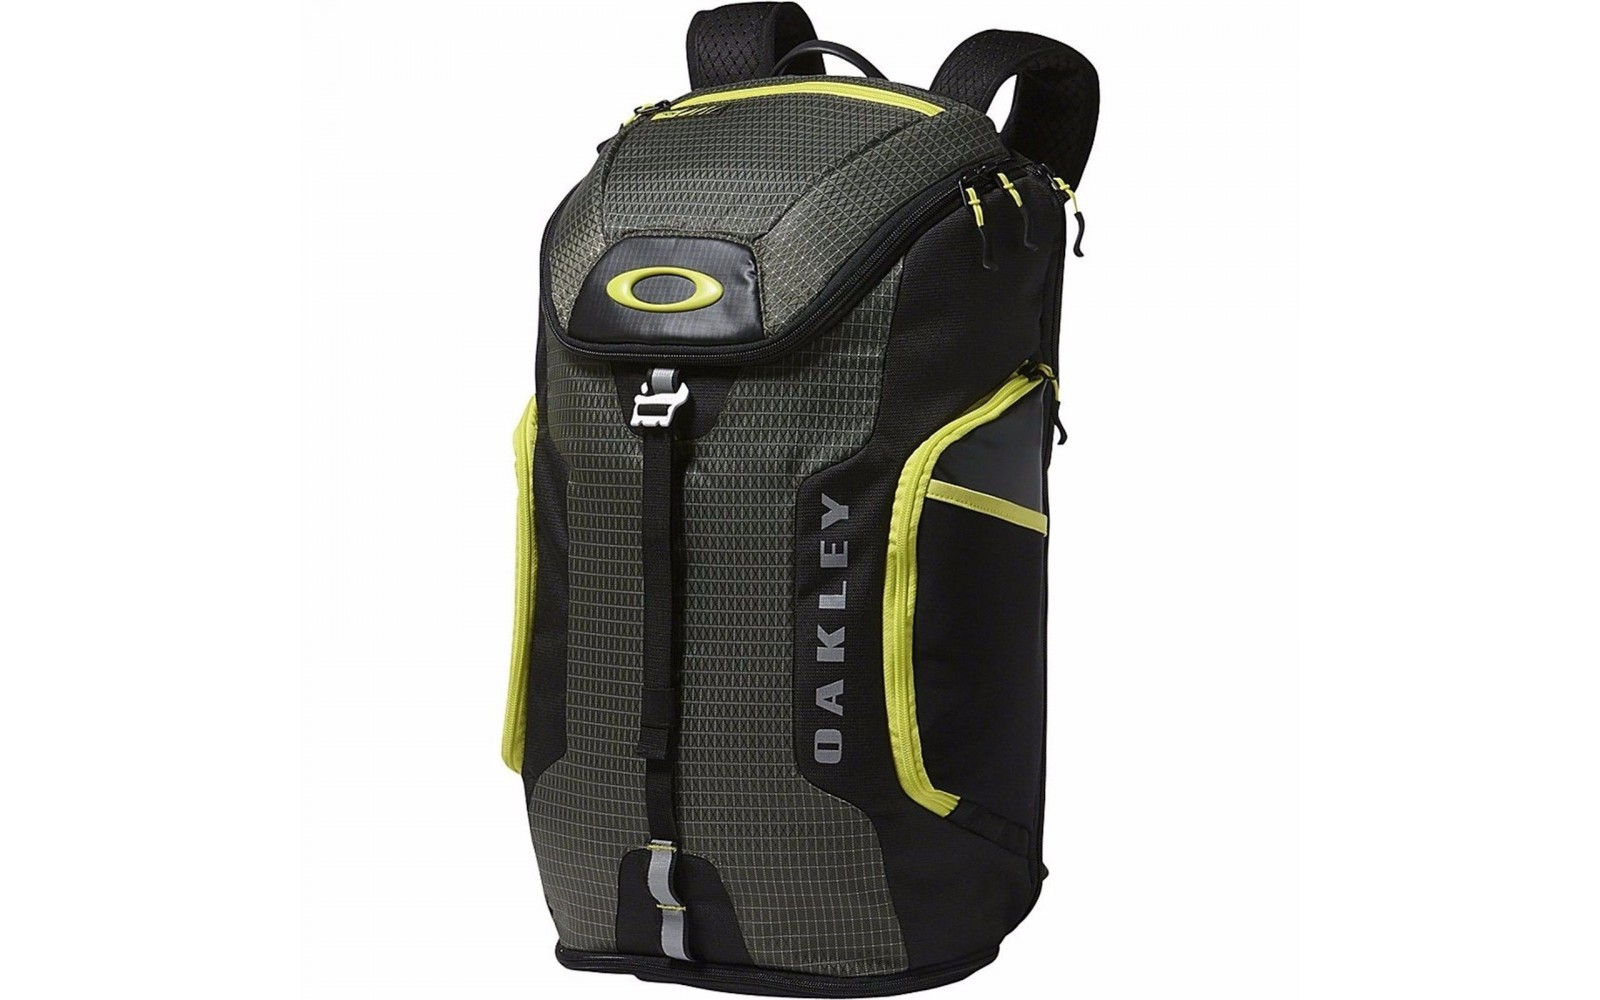 Oakley Link Backpack - Dark Brush - 92910-86V Rugzak